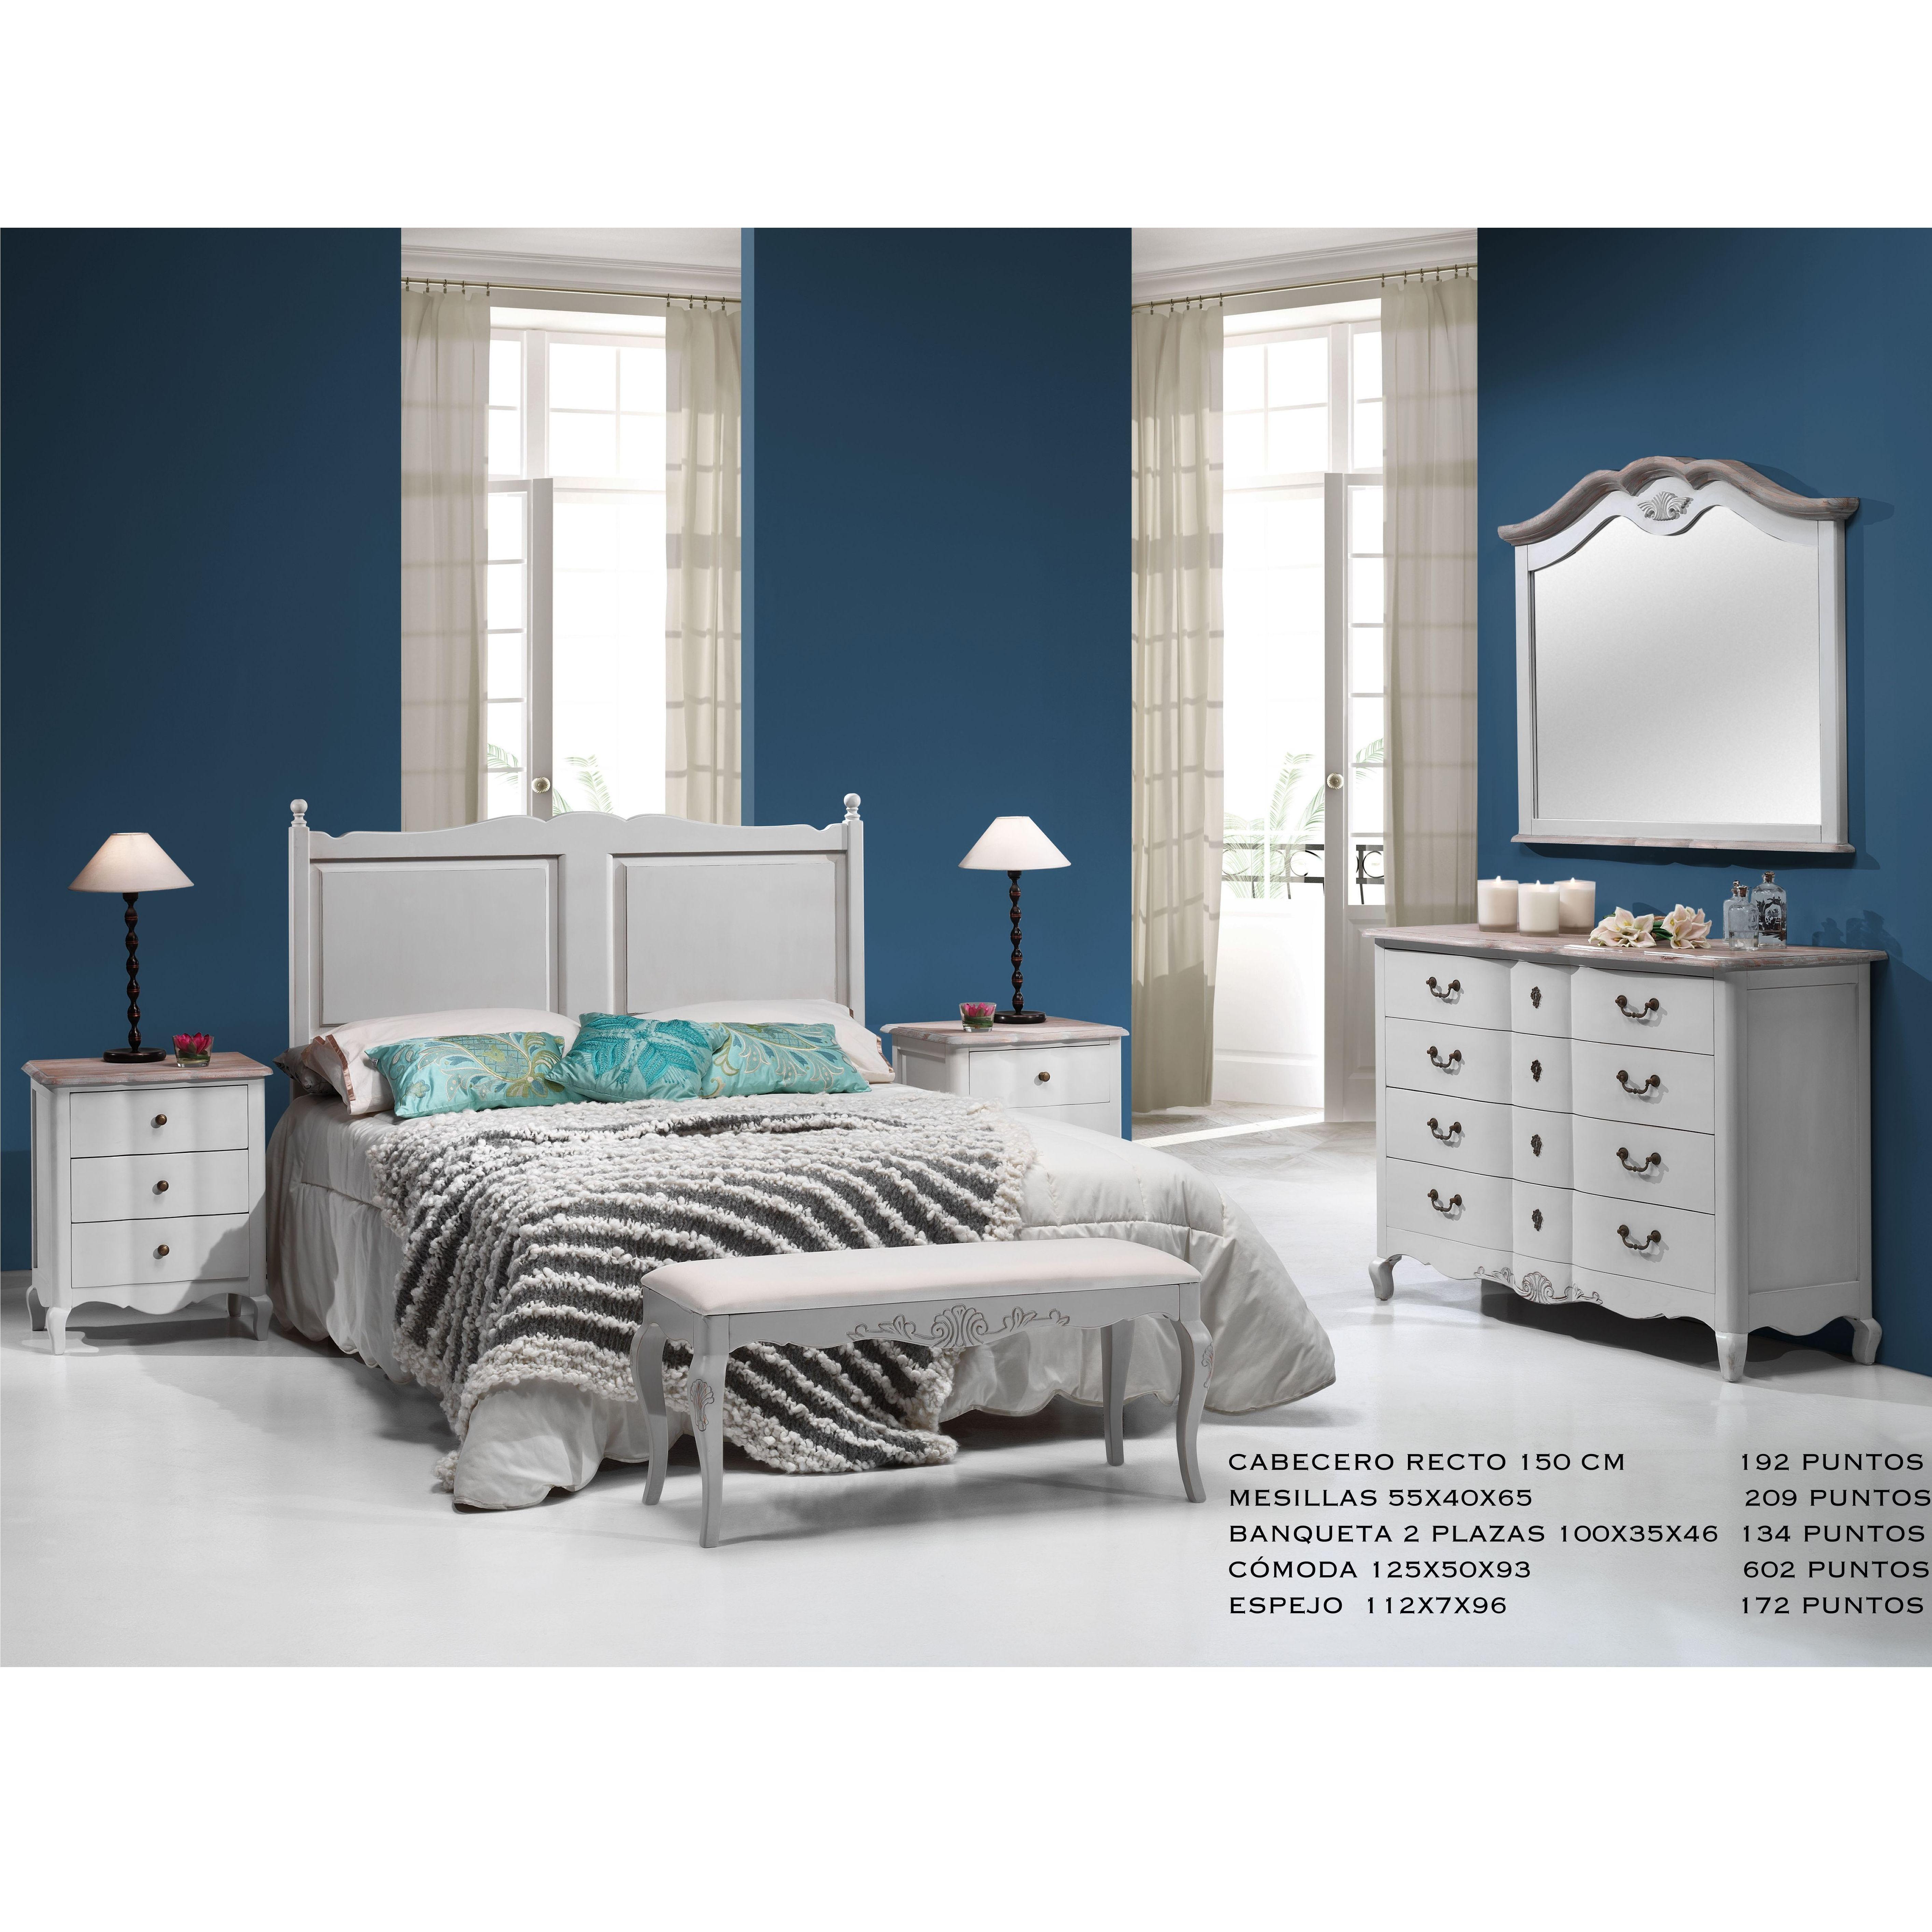 Dormitorios: Catálogo de Ké Barato Muebles